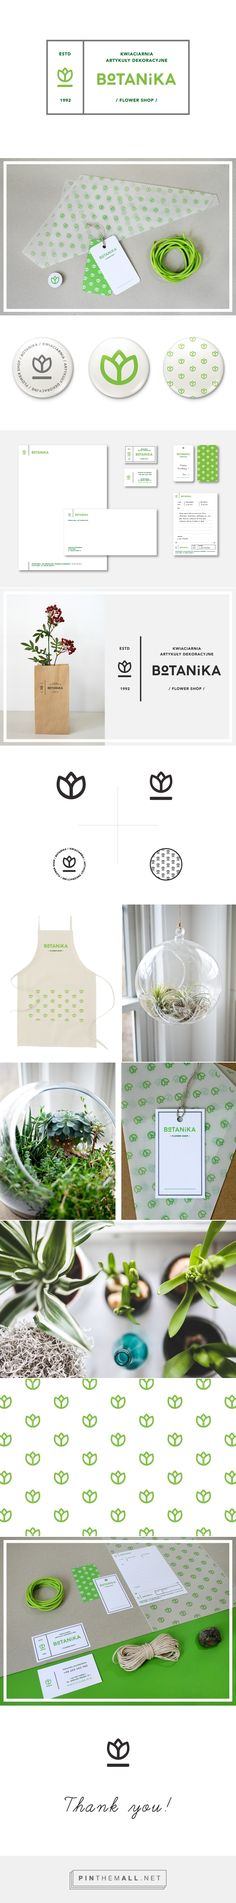 Botanika Flower Shop by Rita Duczmańska | Fivestar Branding Agency – Design and Branding Agency & Curated Inspiration Gallery  #designinspiration #floristbranding #branding #fivestarbrandingagency